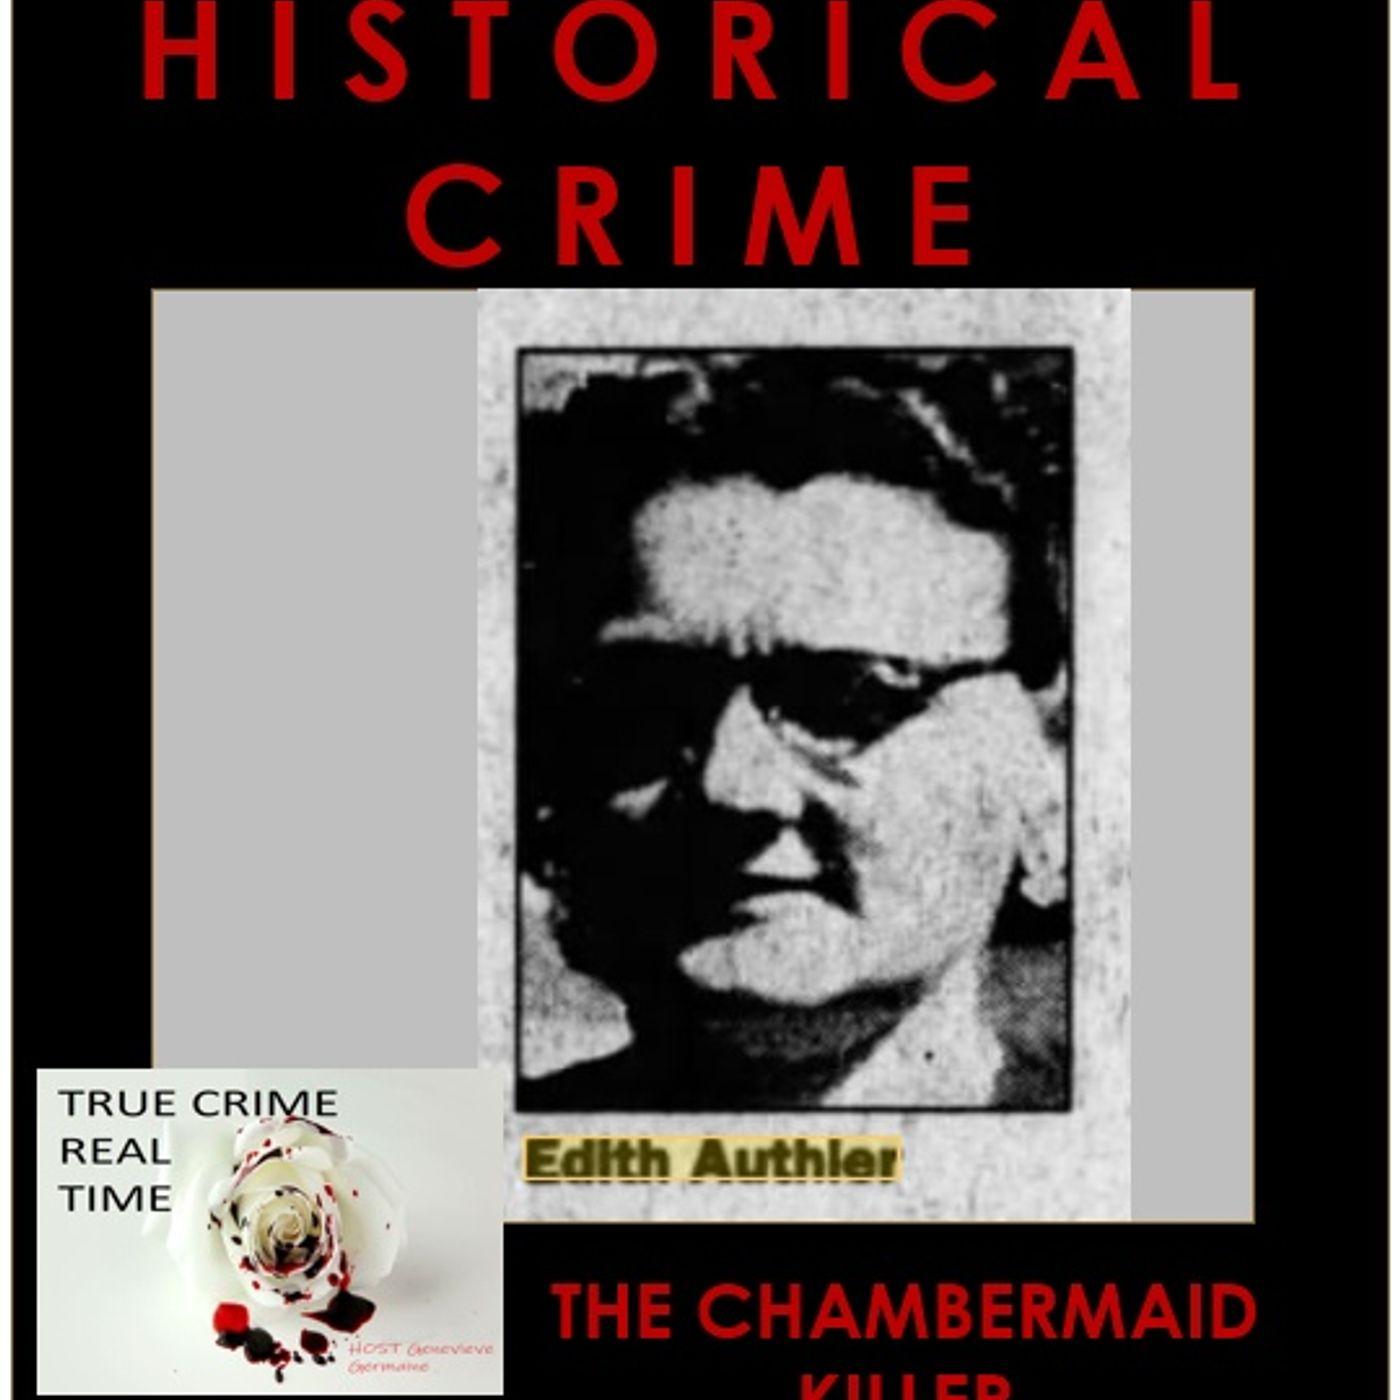 #26 - London's Sordid Past - Part 1 - The Chambermaid Killer